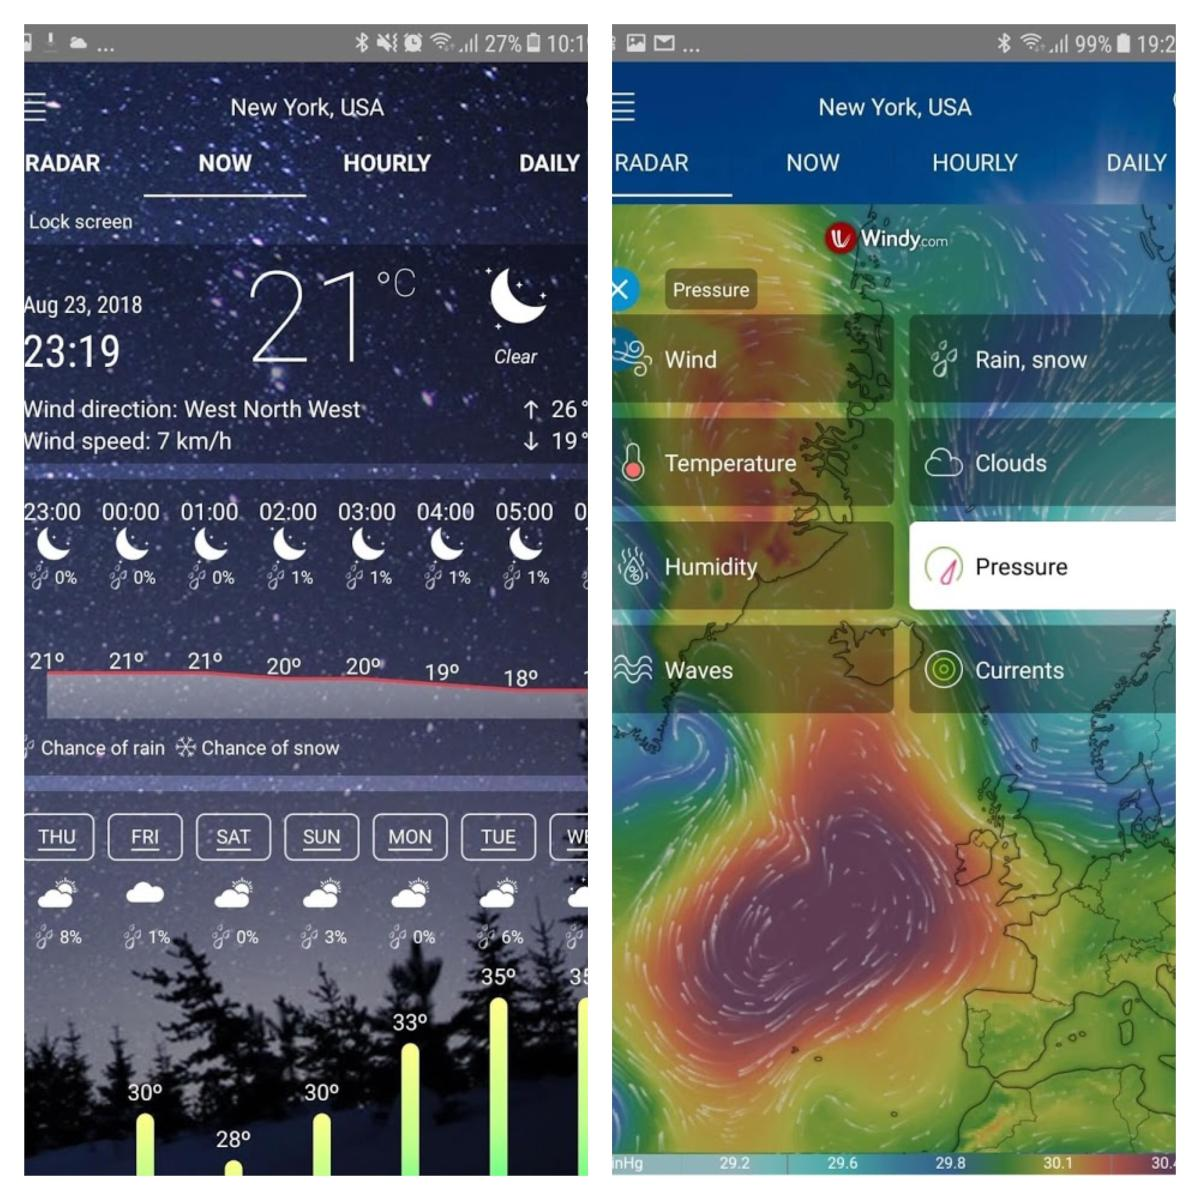 Radar meteorológico aplicación